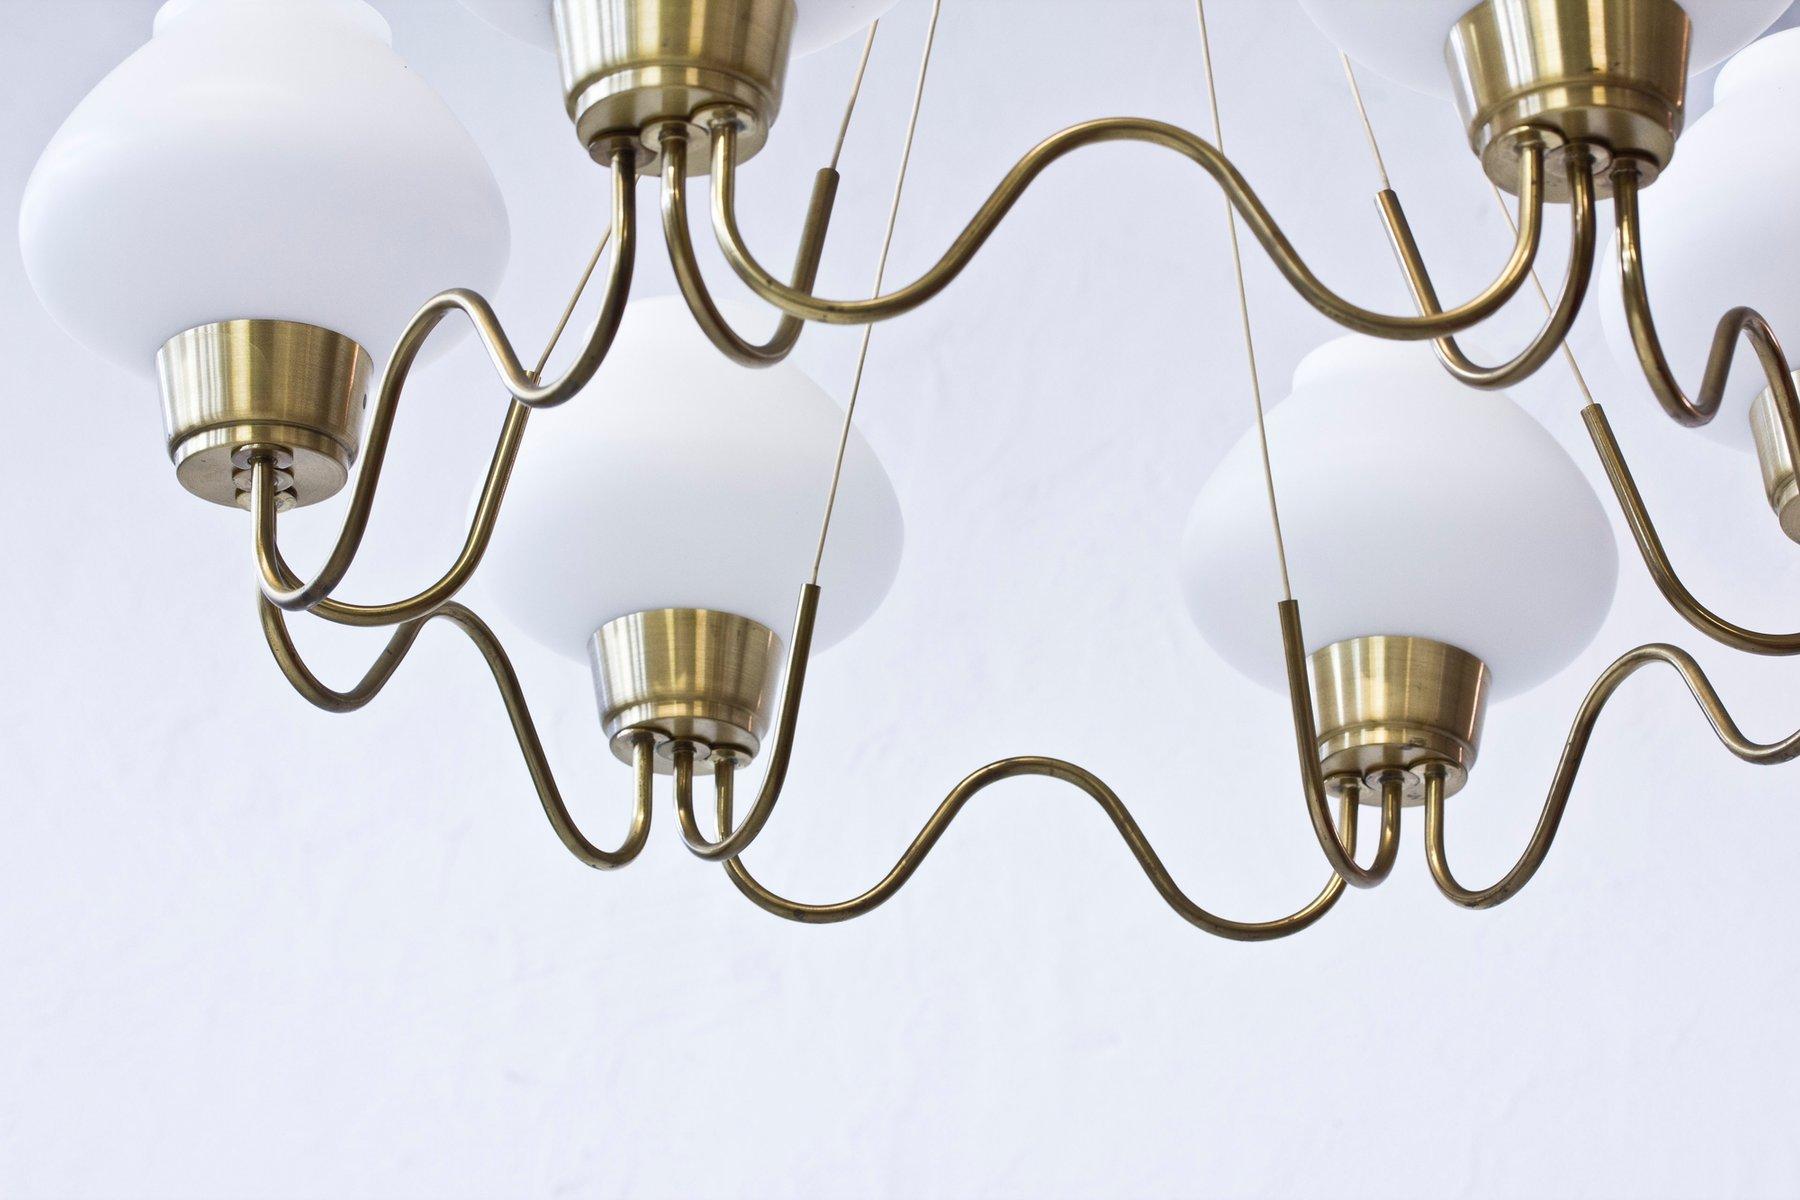 Swedish chandelier 1940s for sale at pamono price 243300 regular price 295600 arubaitofo Gallery